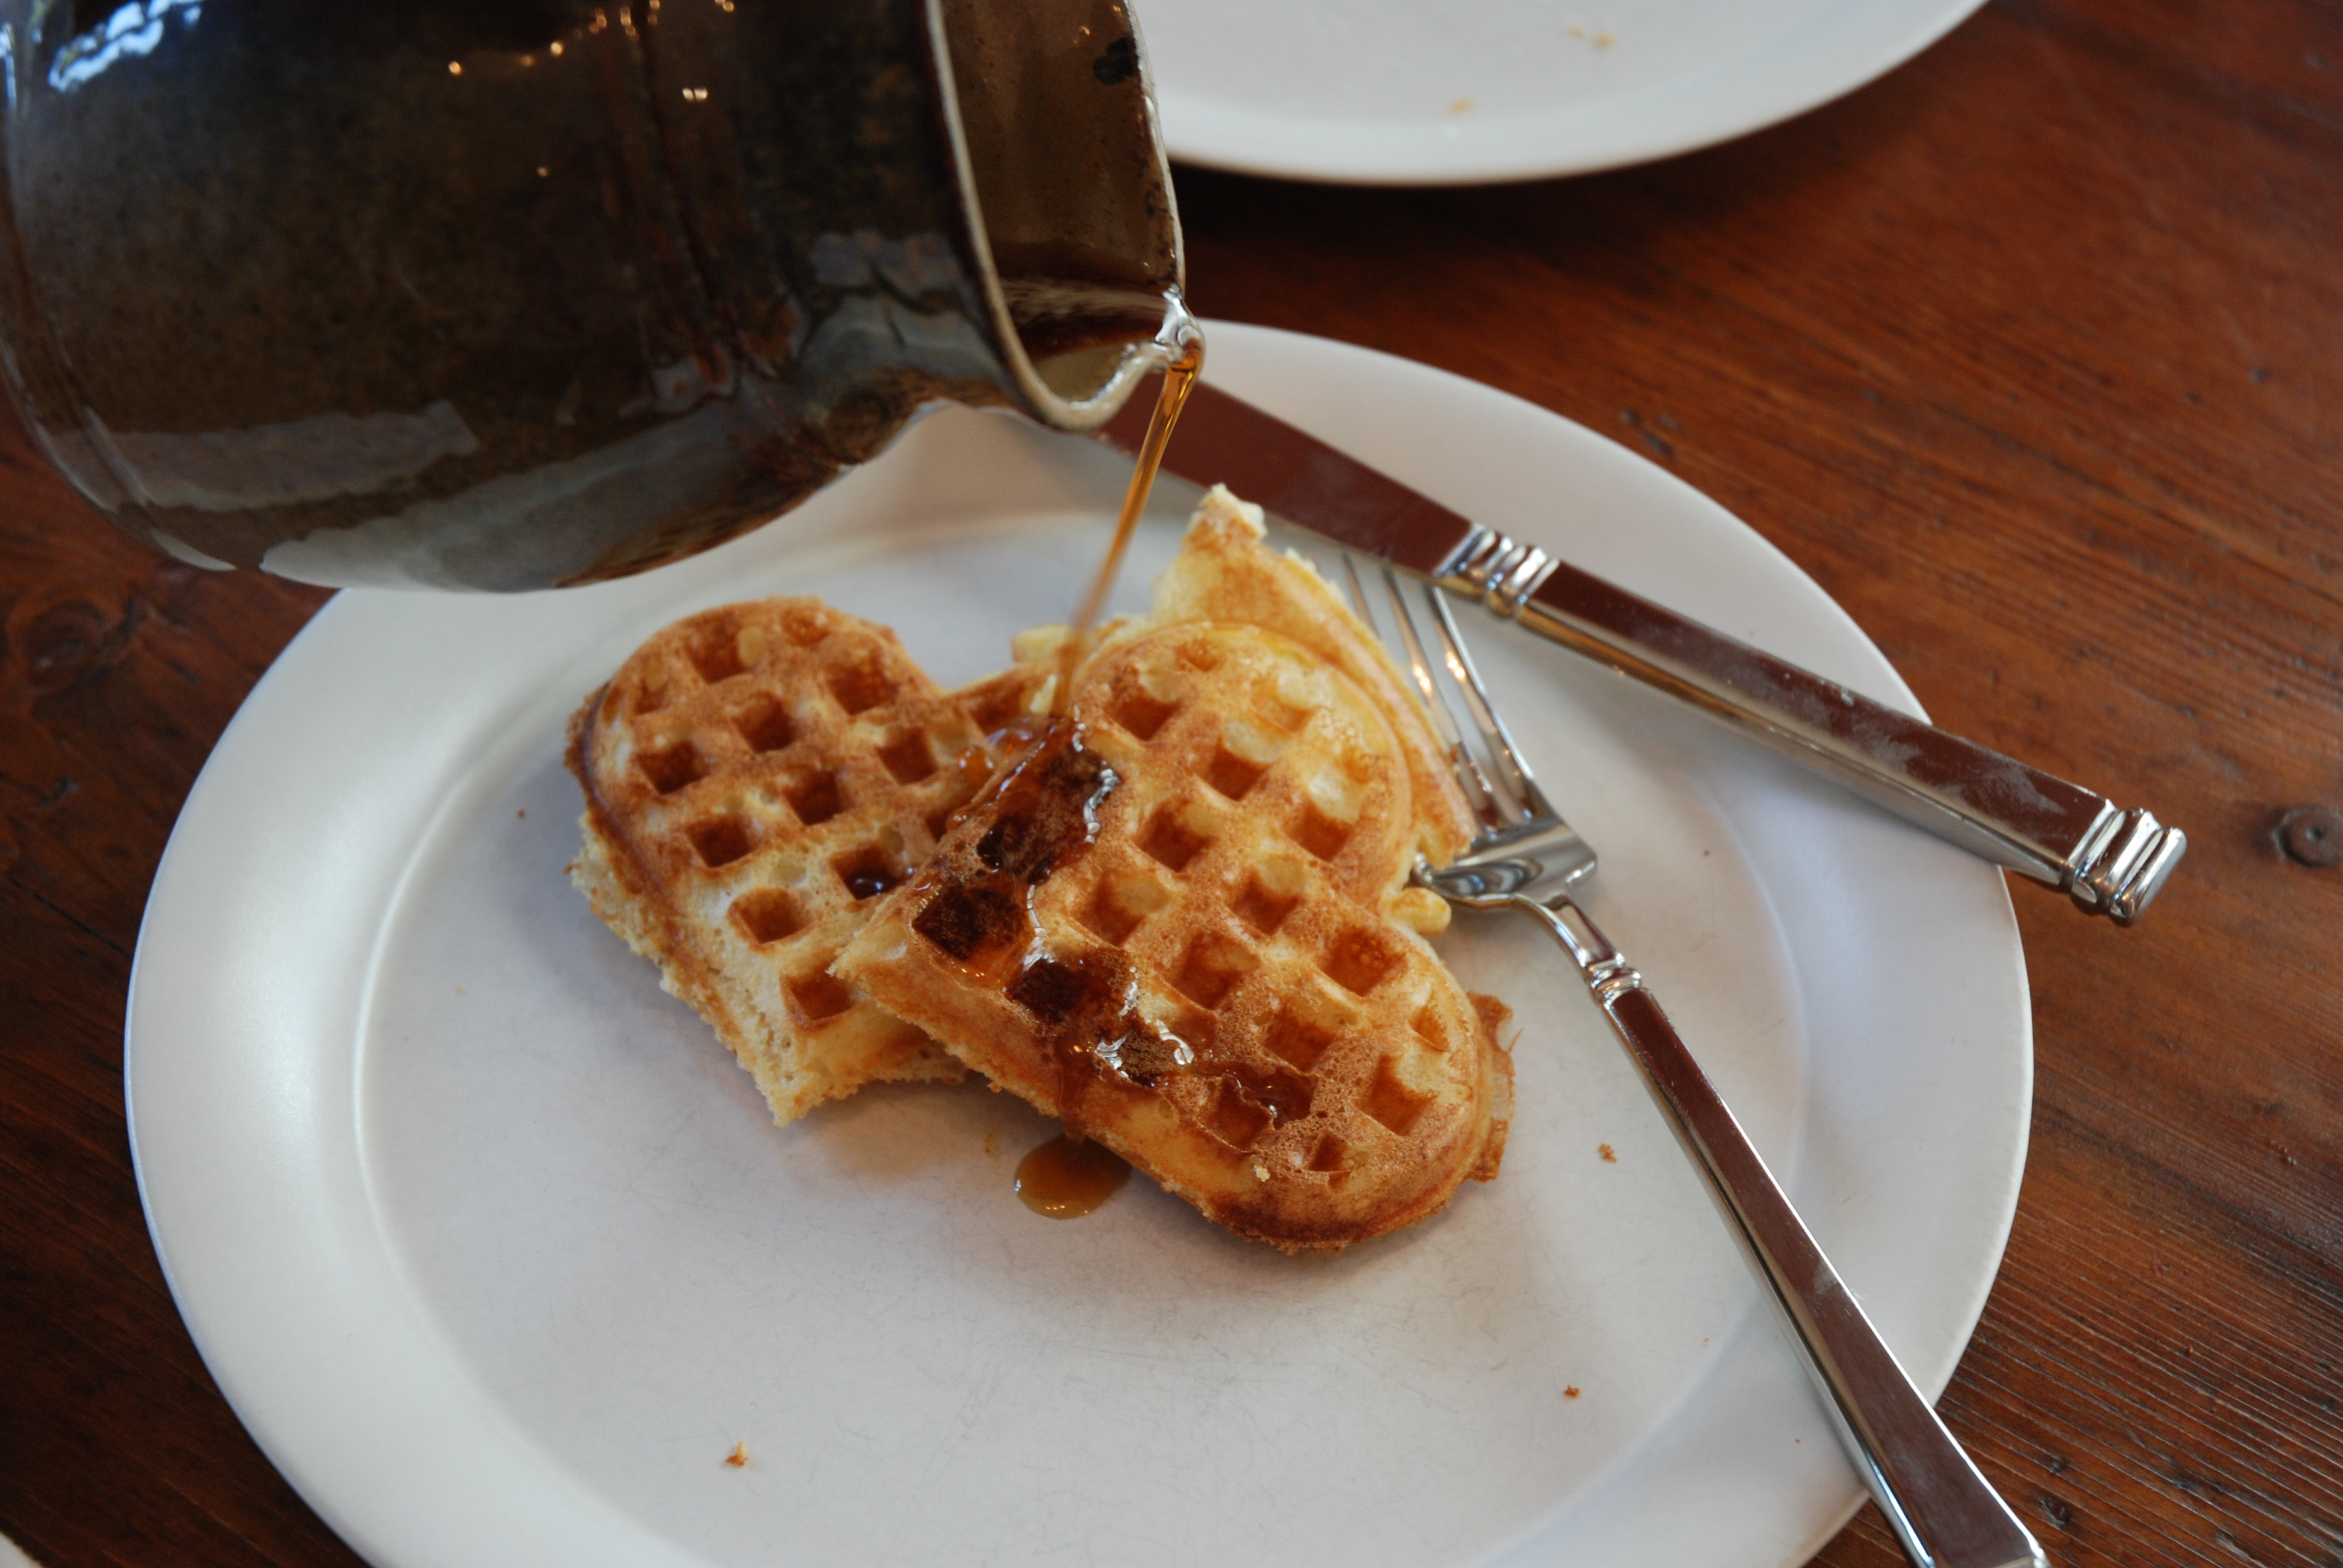 waffleandsyrup